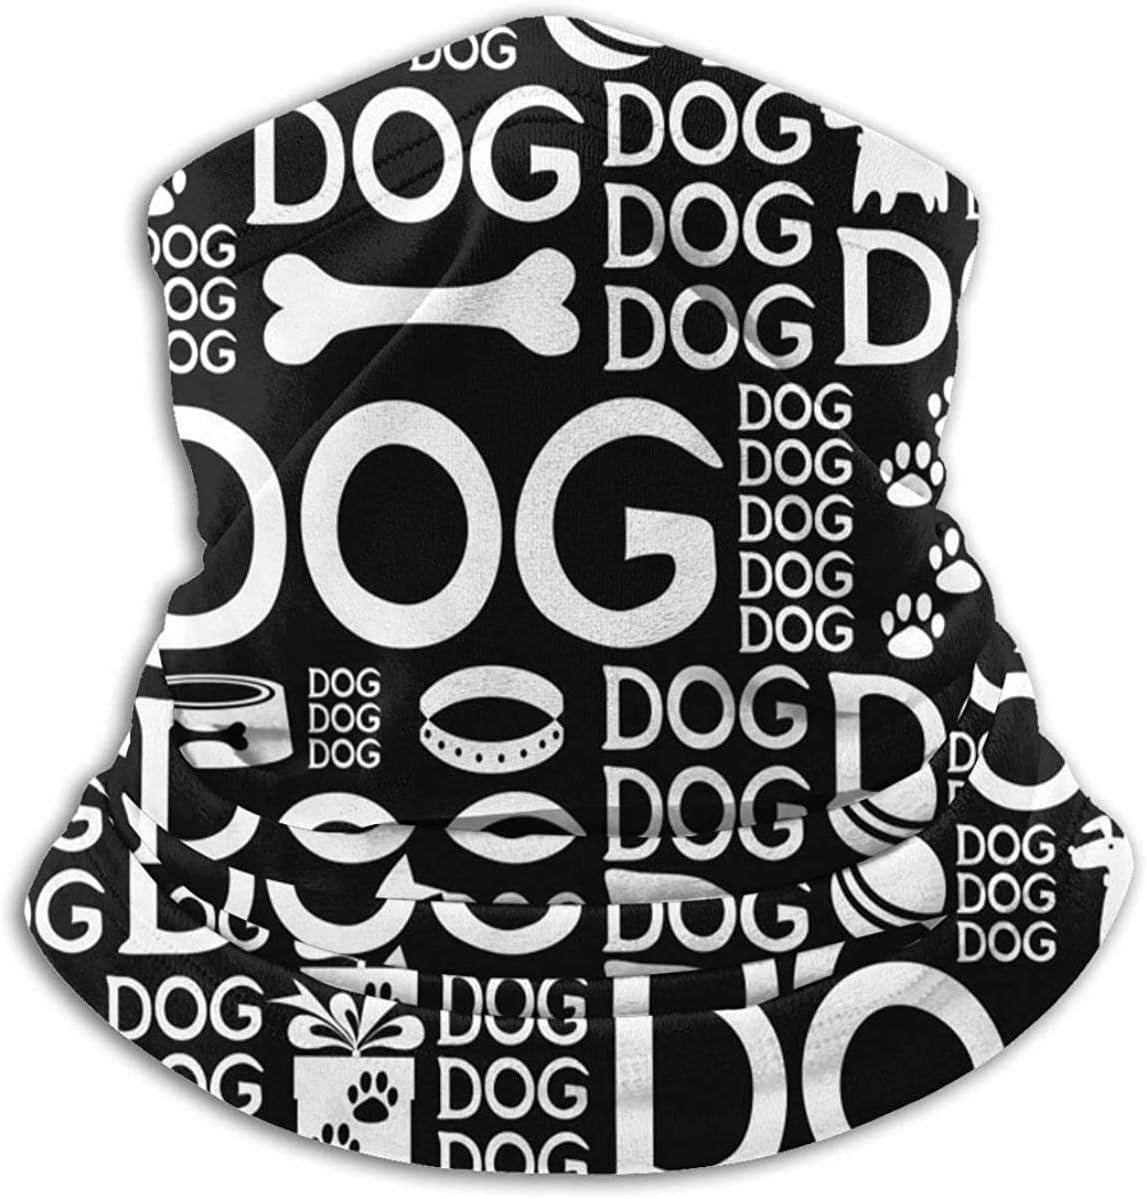 Lastbest Dogs Neck Warmer Multifunction Scarf Hat Neck Gaiter Neck Cap Bala Windproof Neck Heating Wrap Outdoor Sports One Size